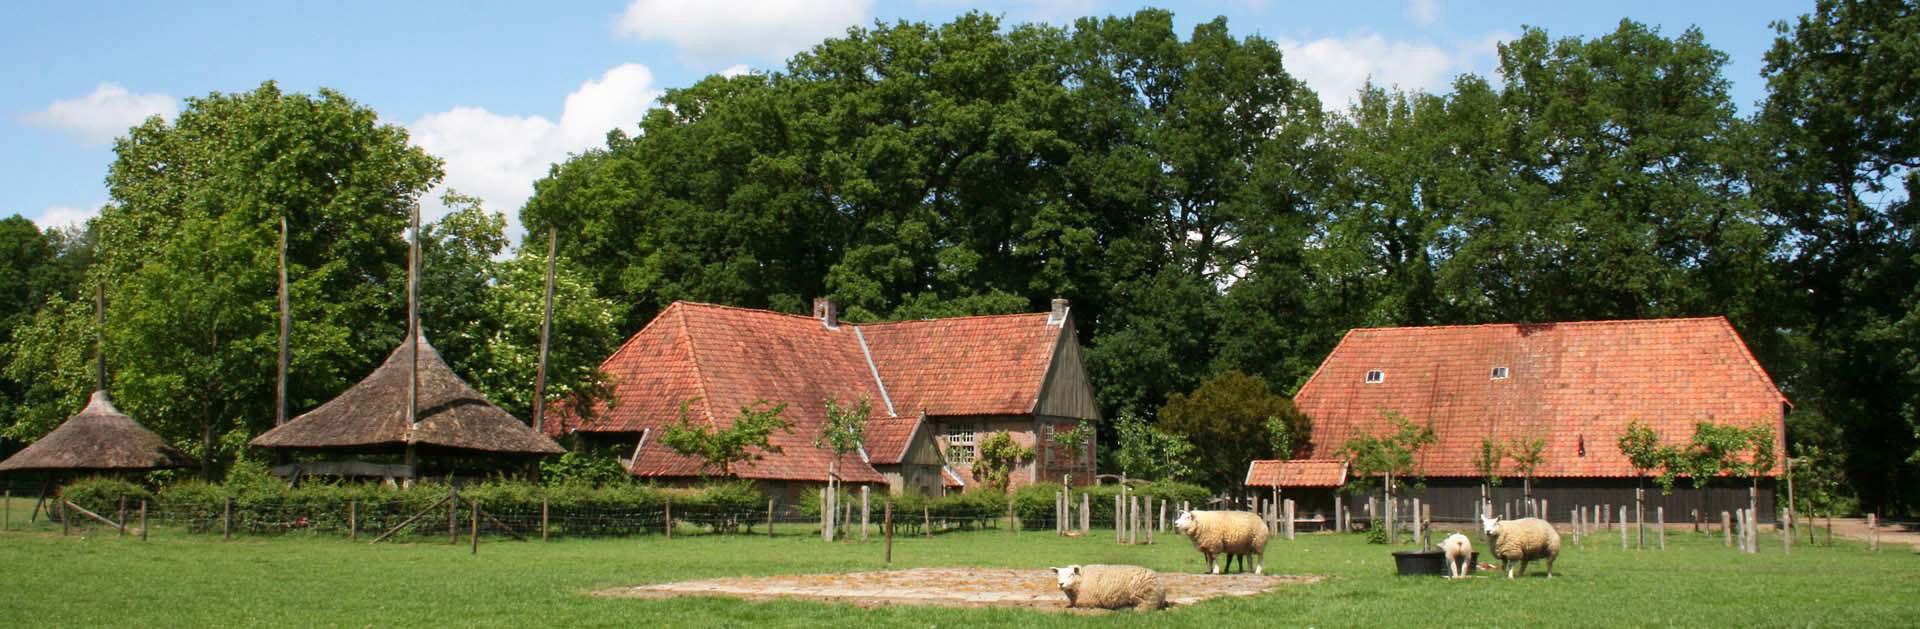 Boerderijmuseum De Lebbenbrugge - Borculo